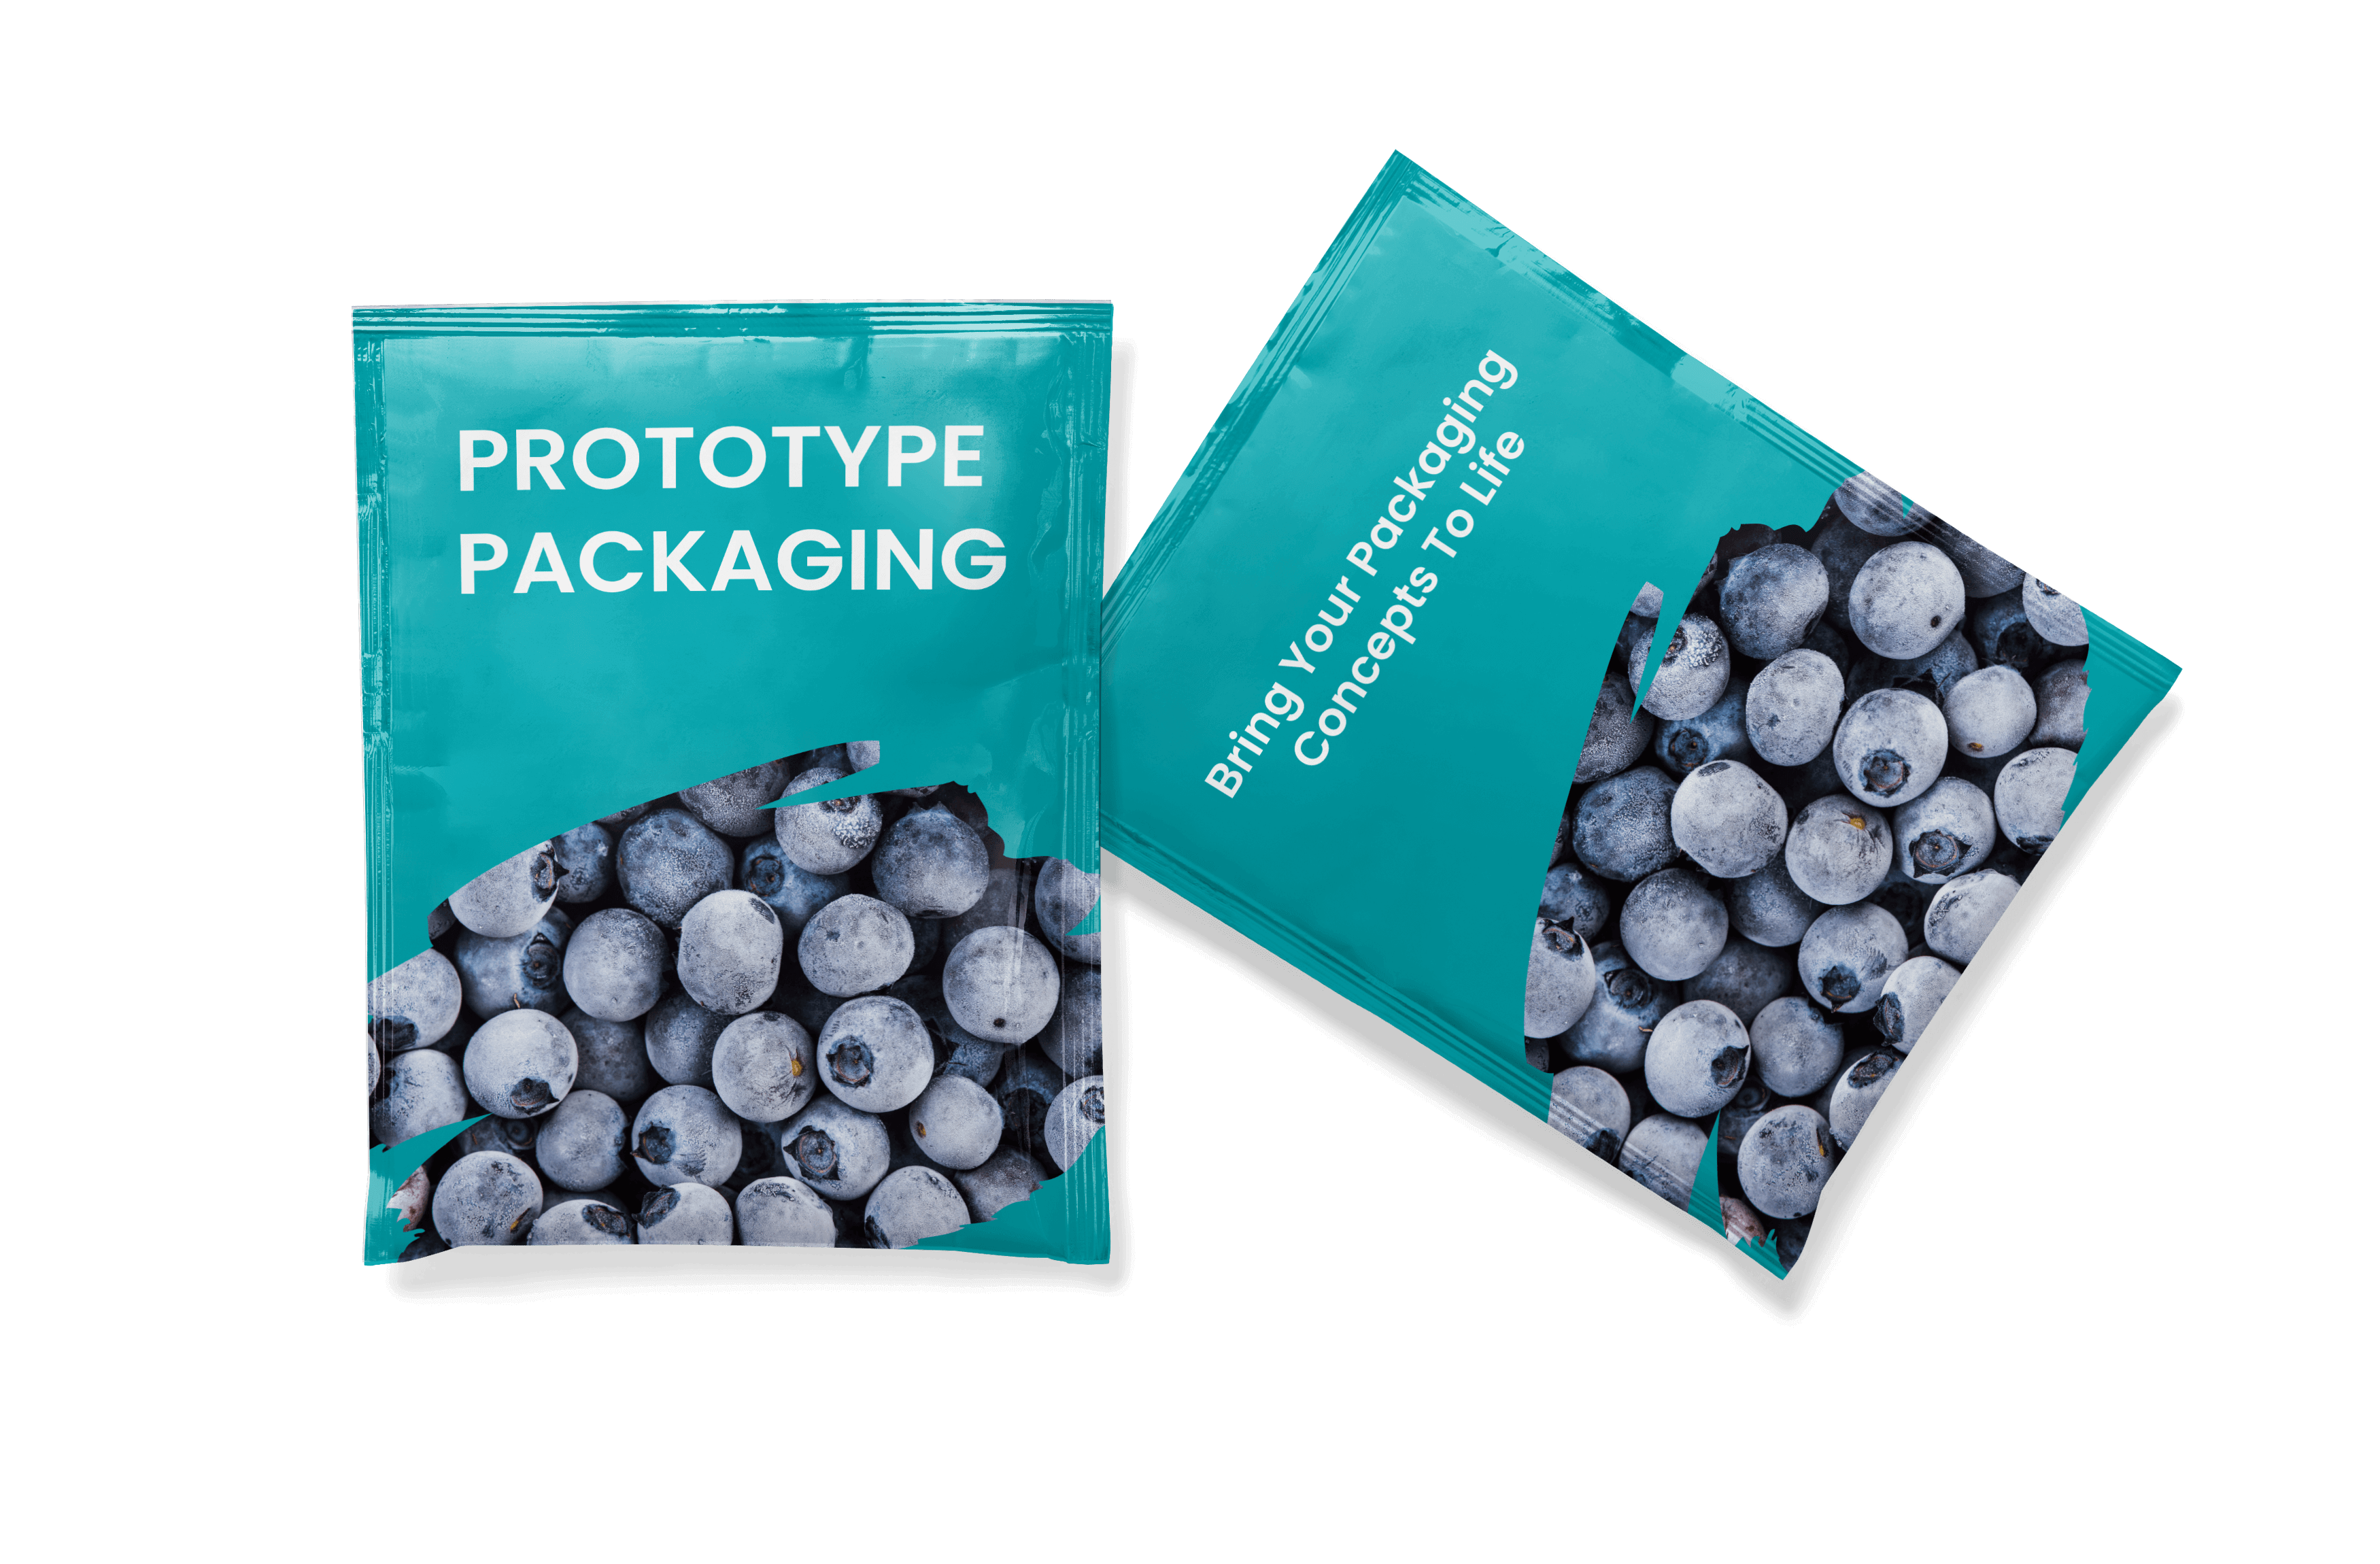 Prototype Packaging Page Header